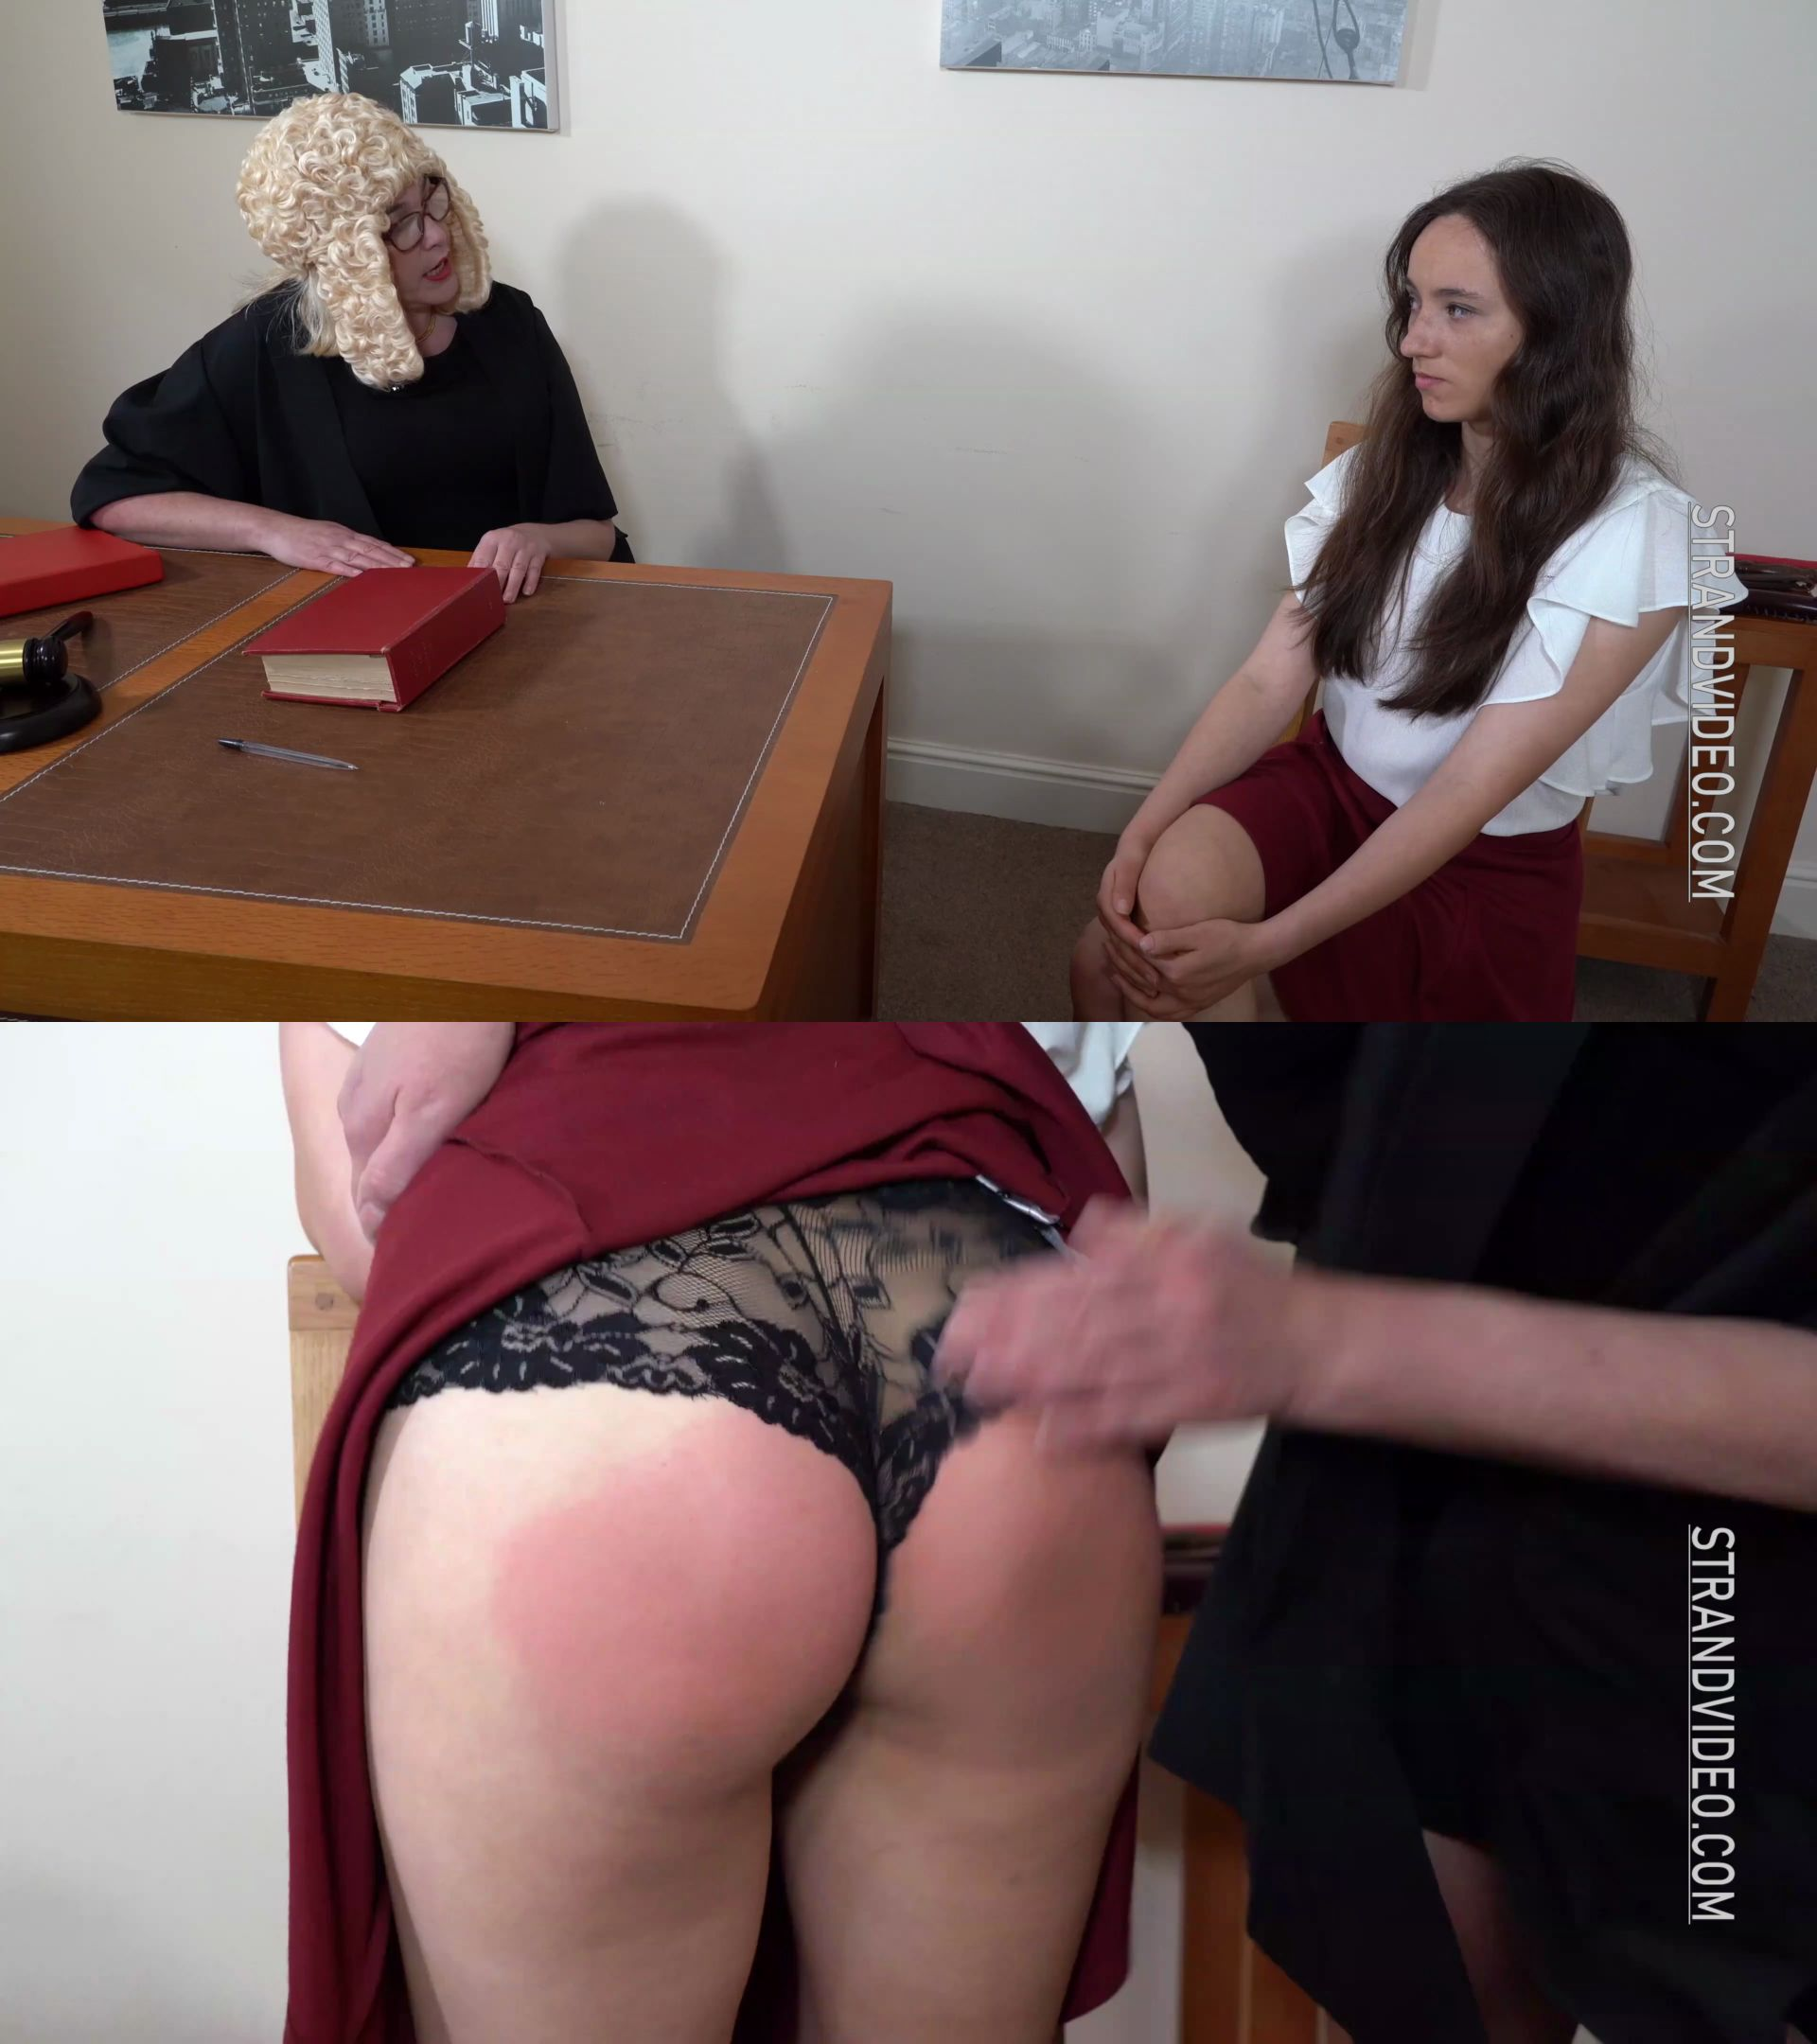 Spanking Sarah – MP4/Ultra HD – Sarah Stern, Mila Grant – The Judge At Home